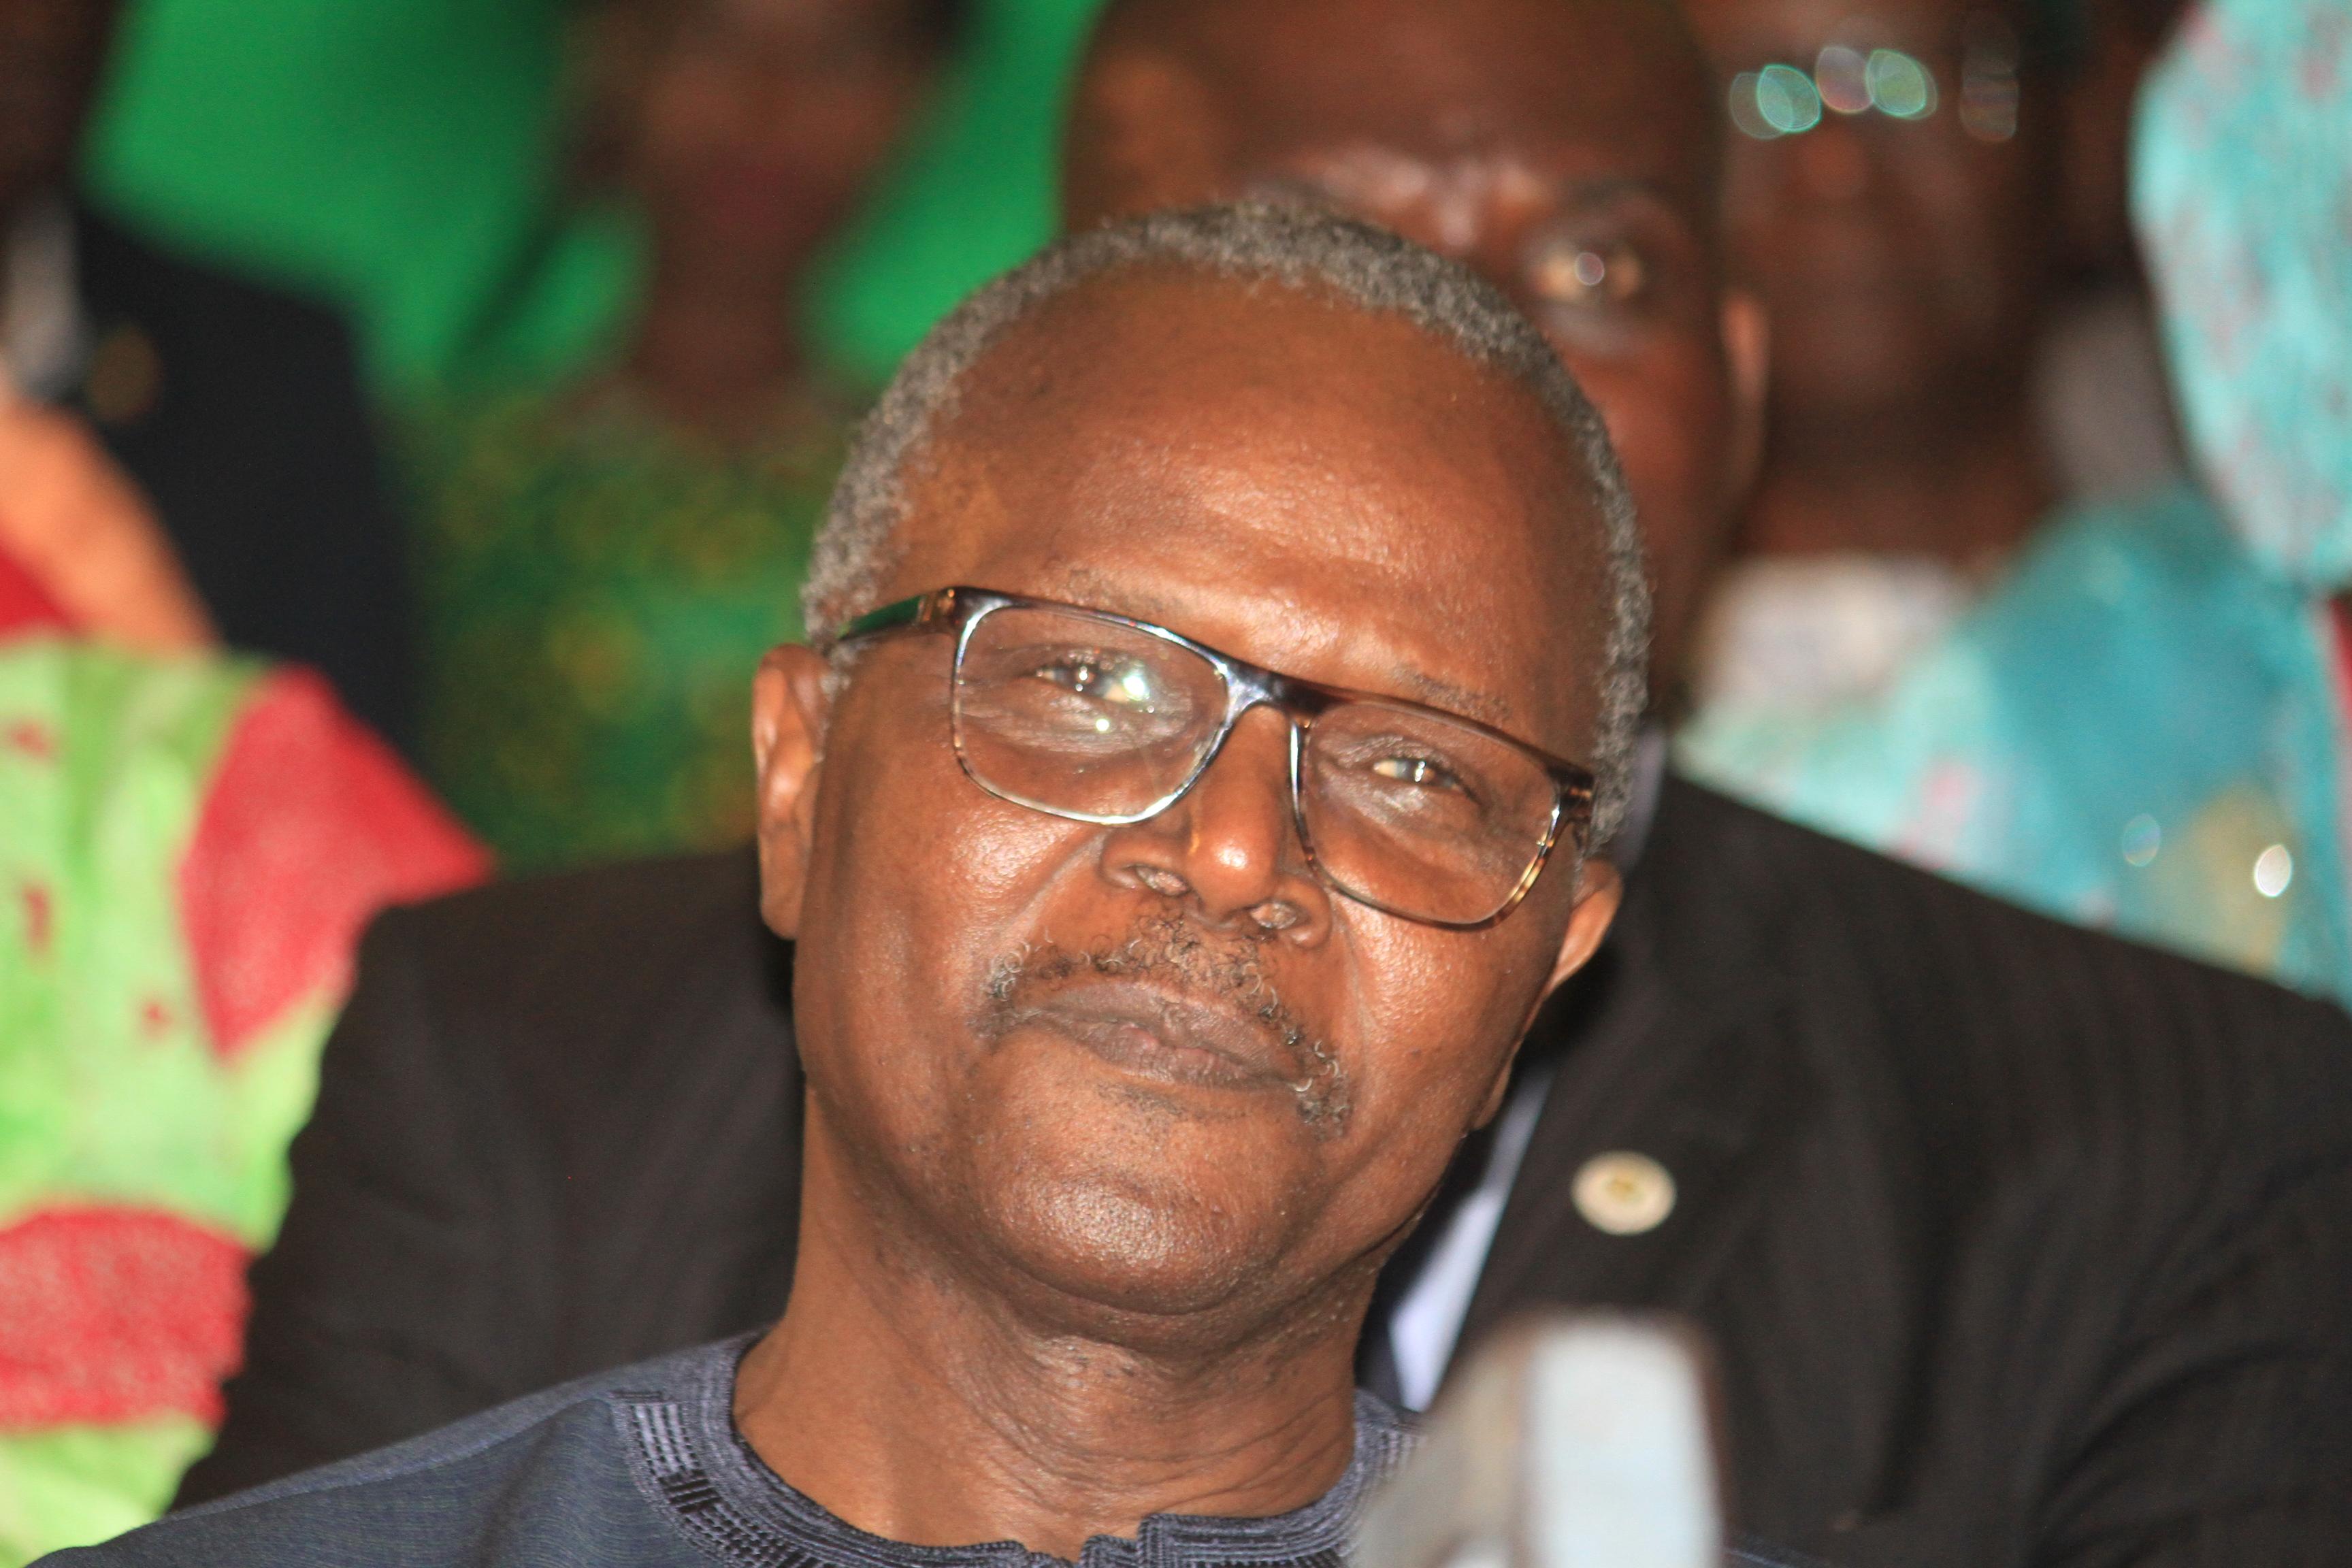 babacar mbengue, khalil kamara, Ousmane Tanor Dieng, Parti Socialiste